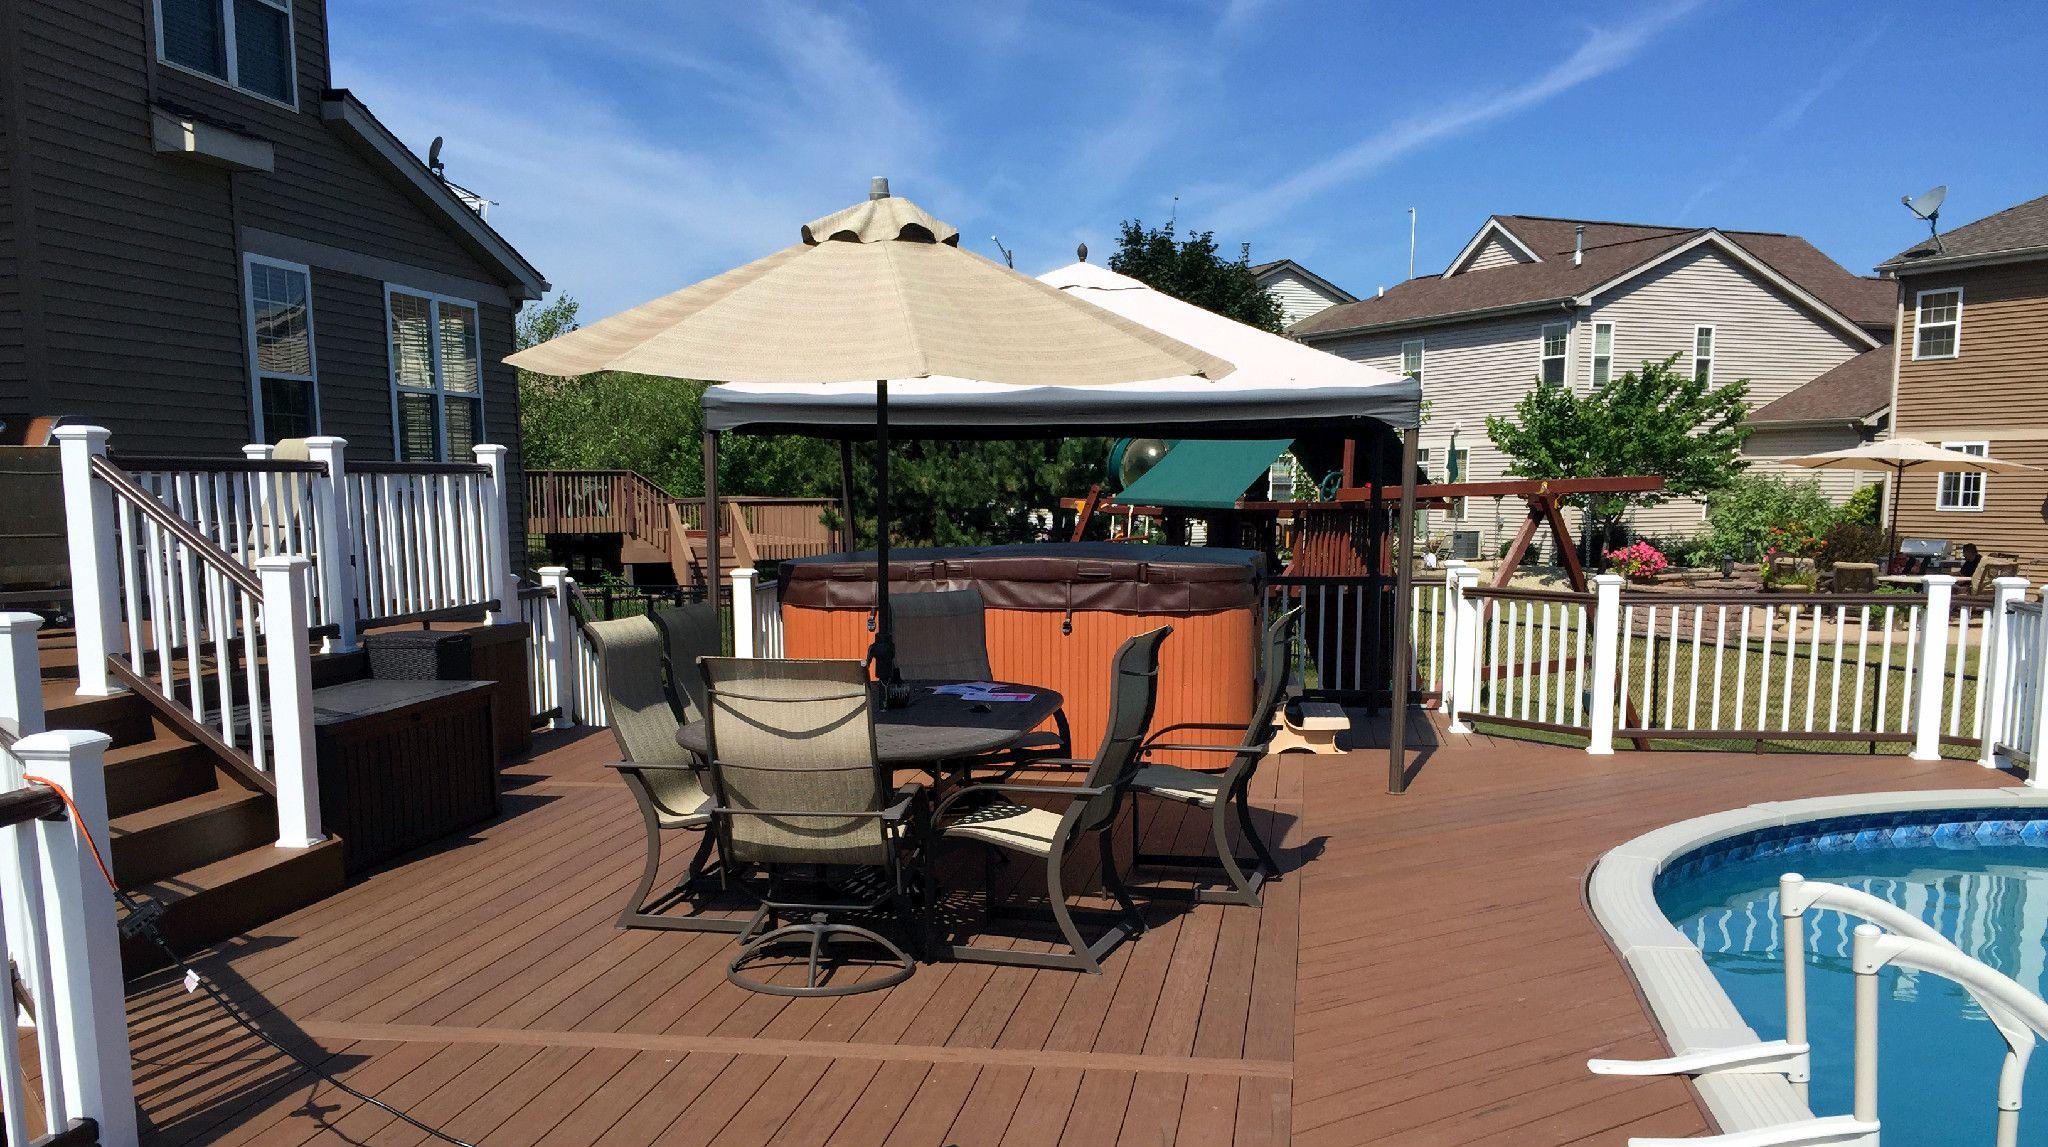 Composite Pool Deck Design By Chicago Suburb Deck Builder Deck